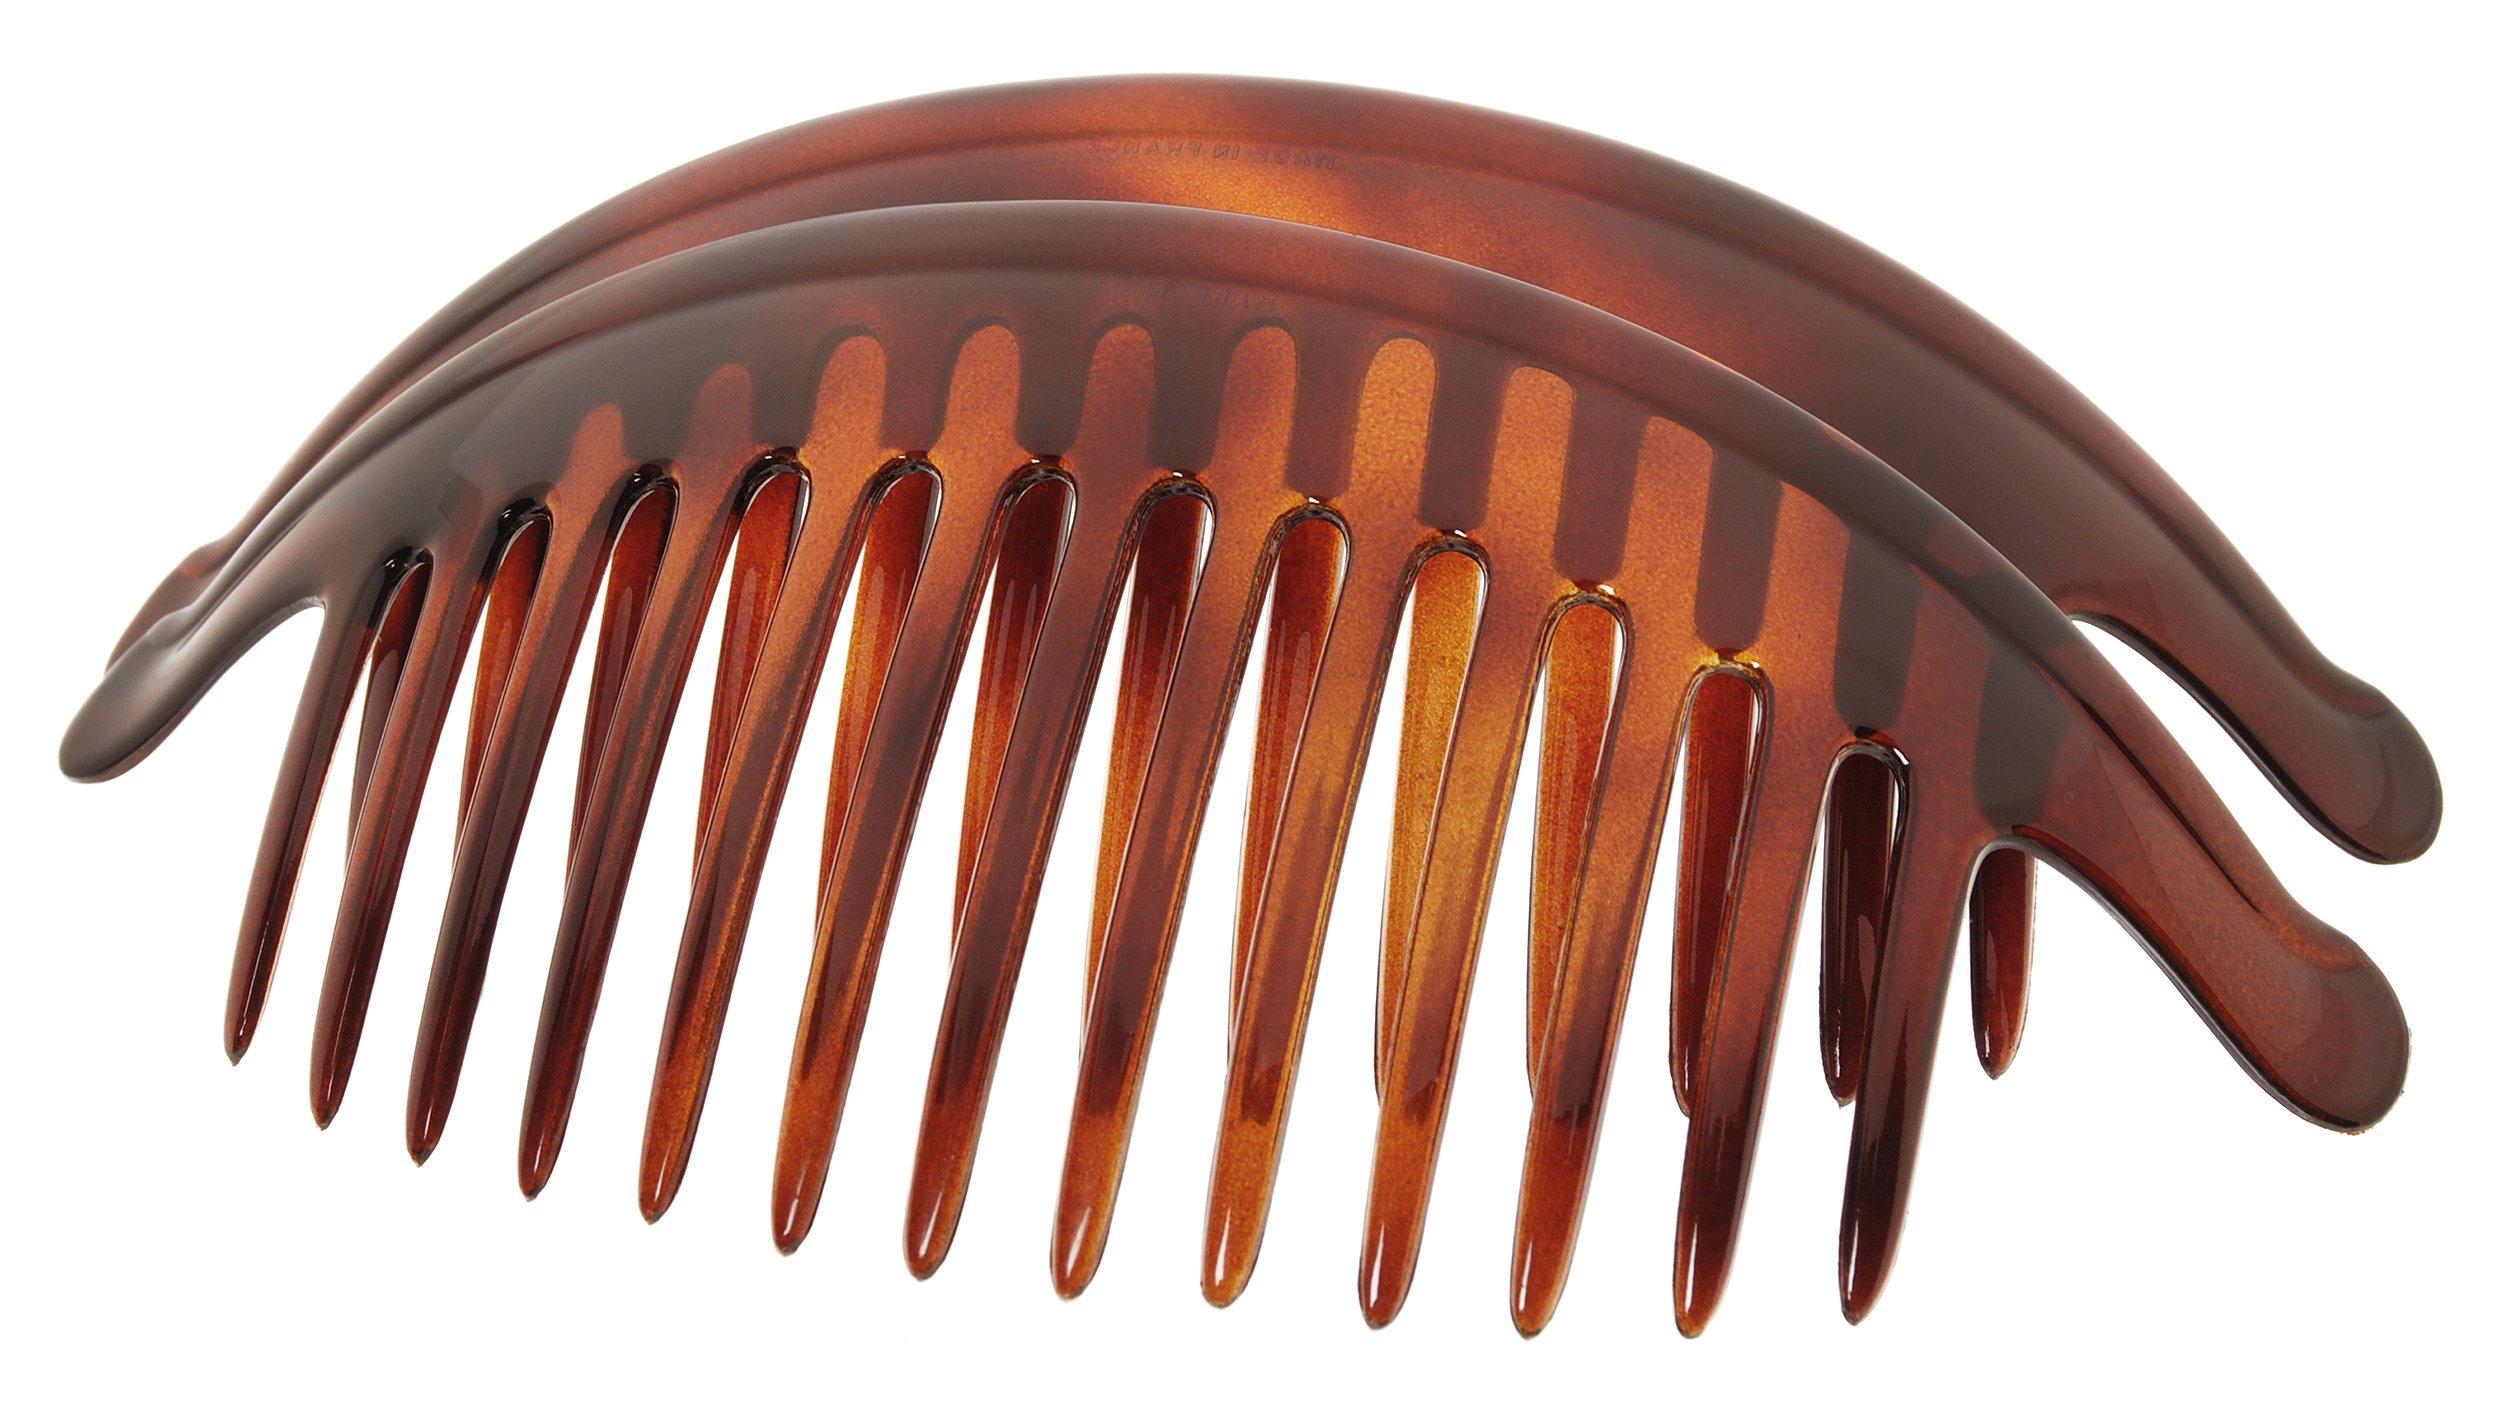 France Luxe Belle Large Interlocking Comb Pair - Tortoise